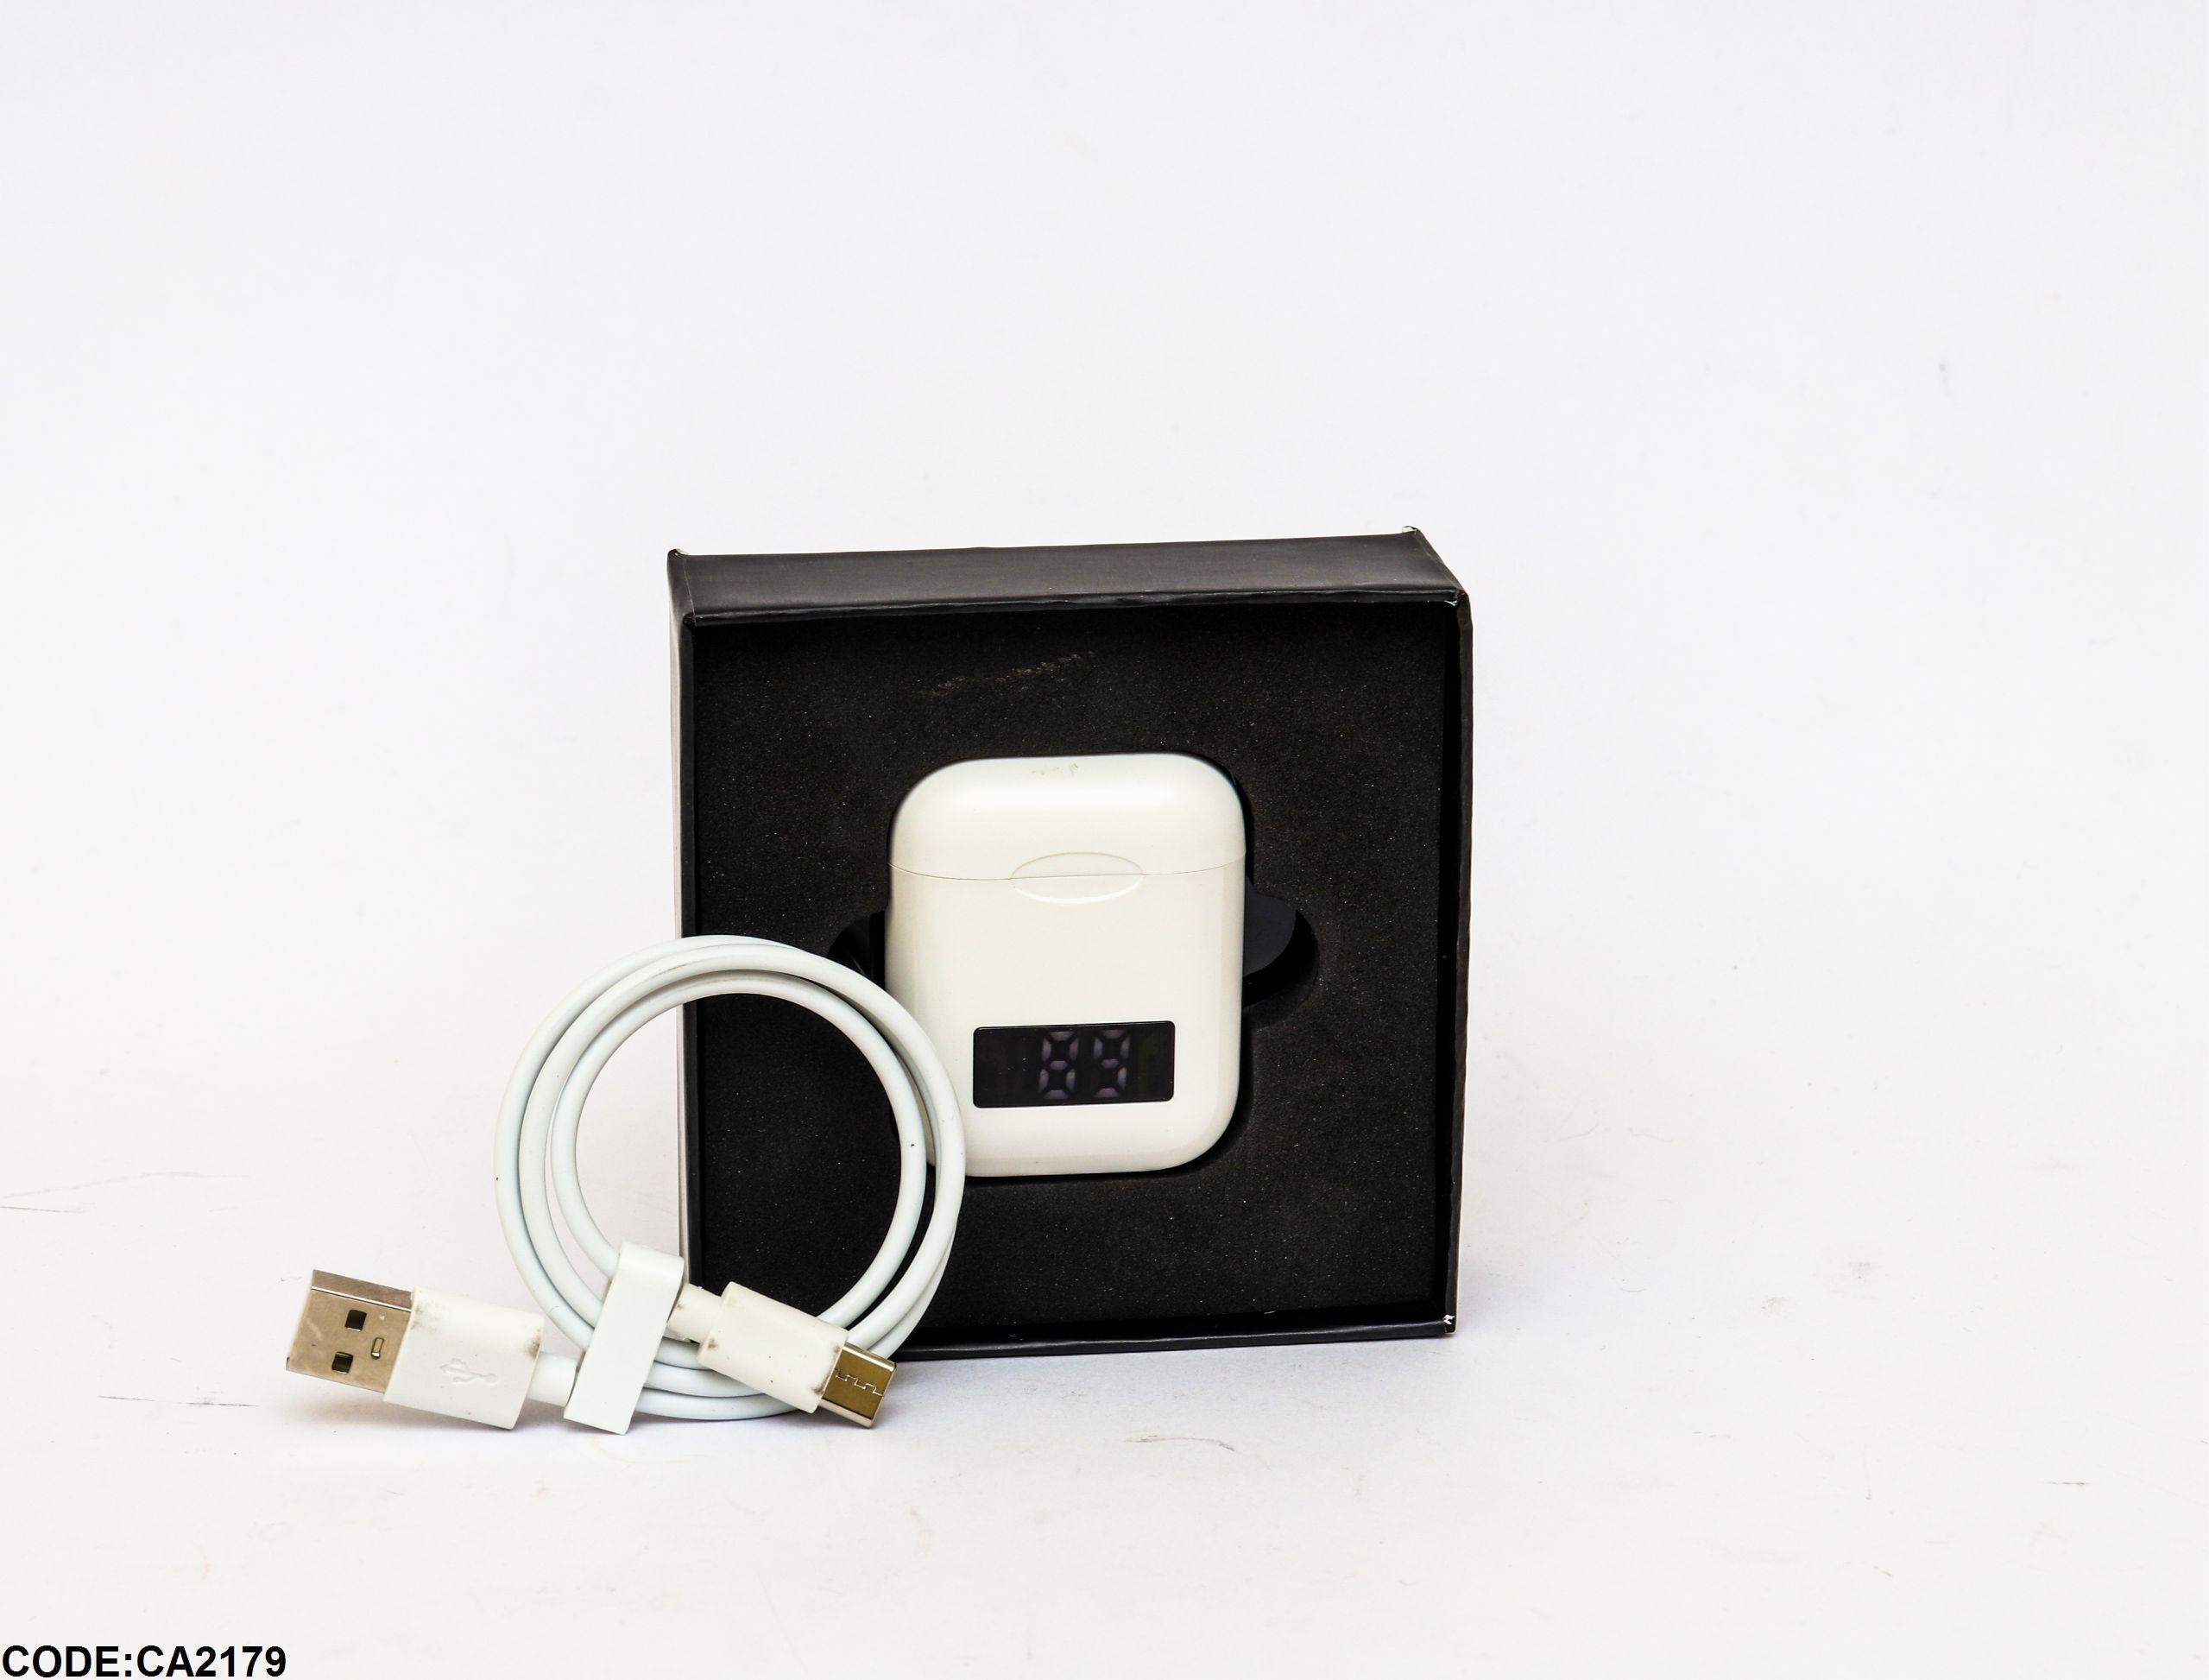 Airpods I99 بسعر 350ج بدل من 550ج Phone Accessories Phone Ring Phone